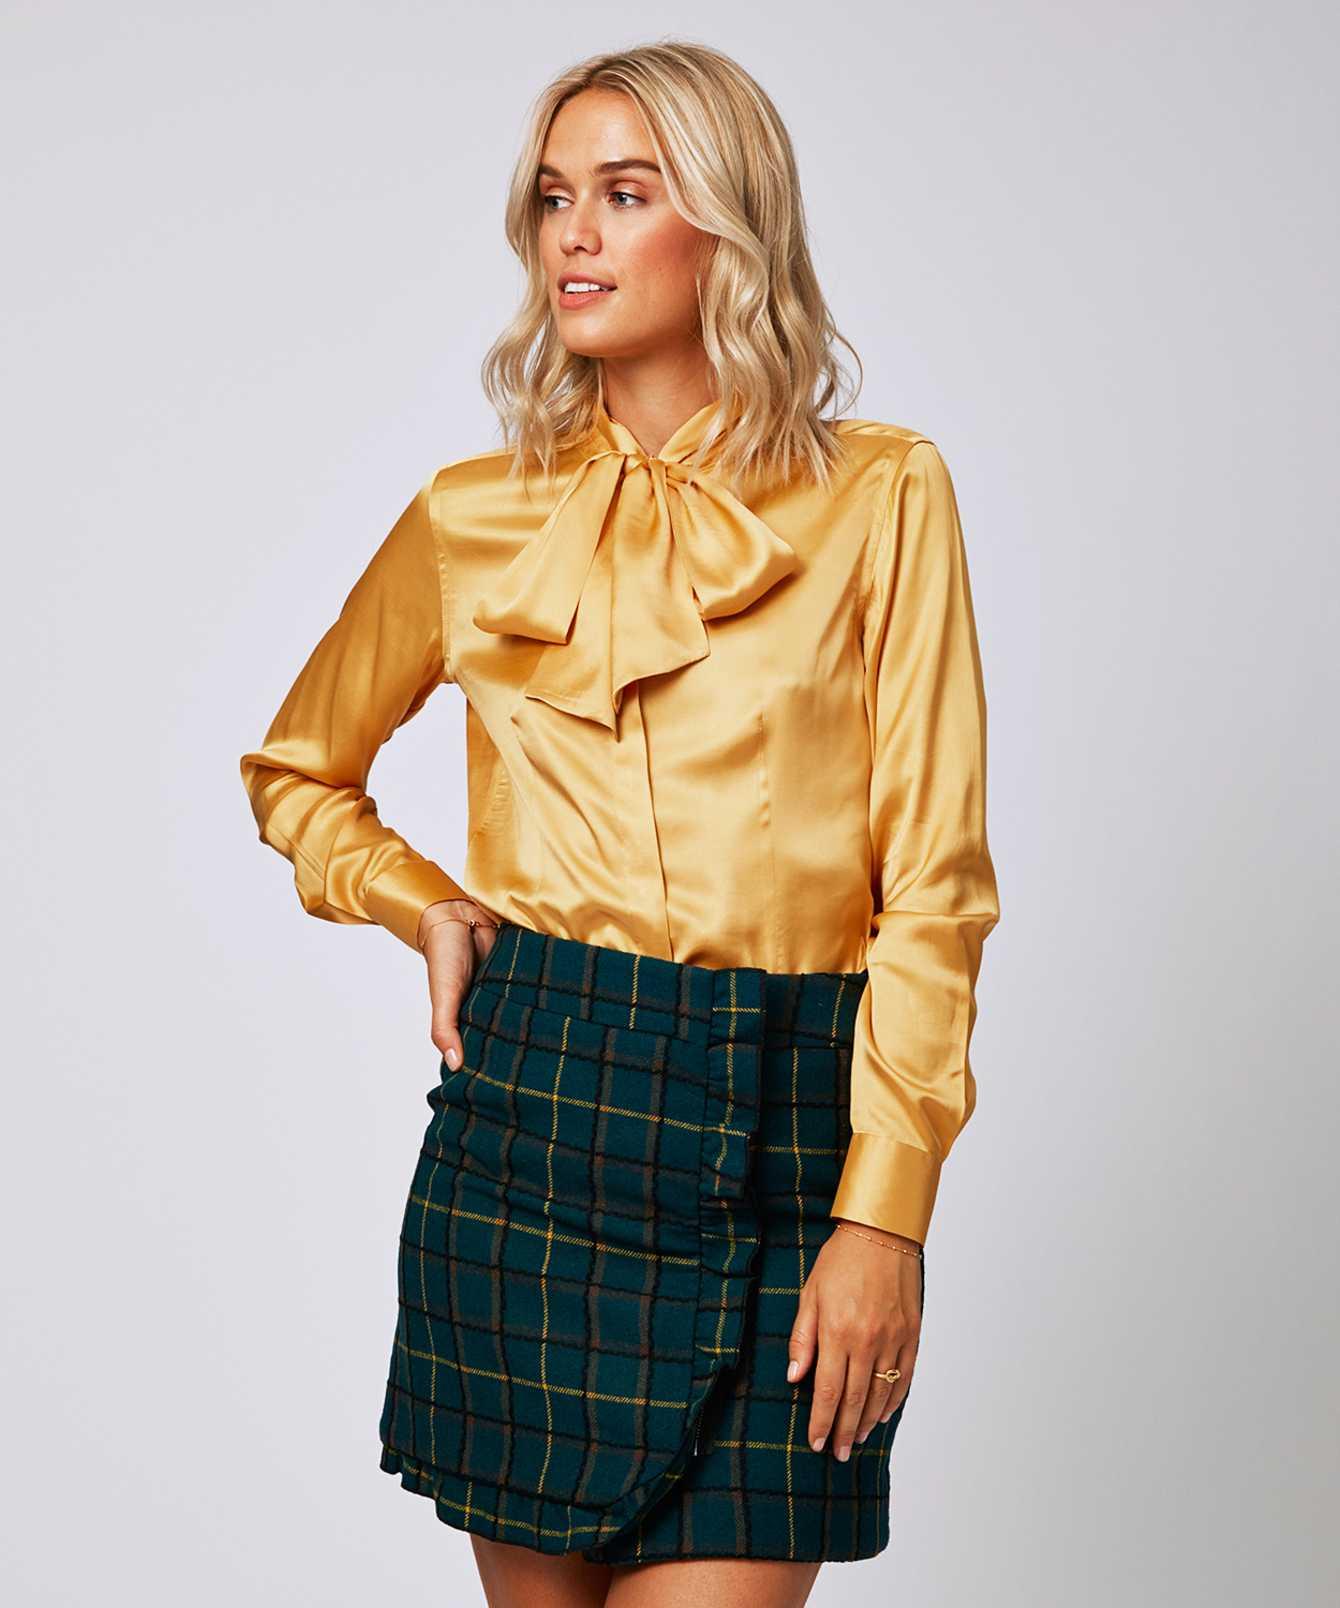 Skjorta Karin Sublime Guld The Shirt Factory